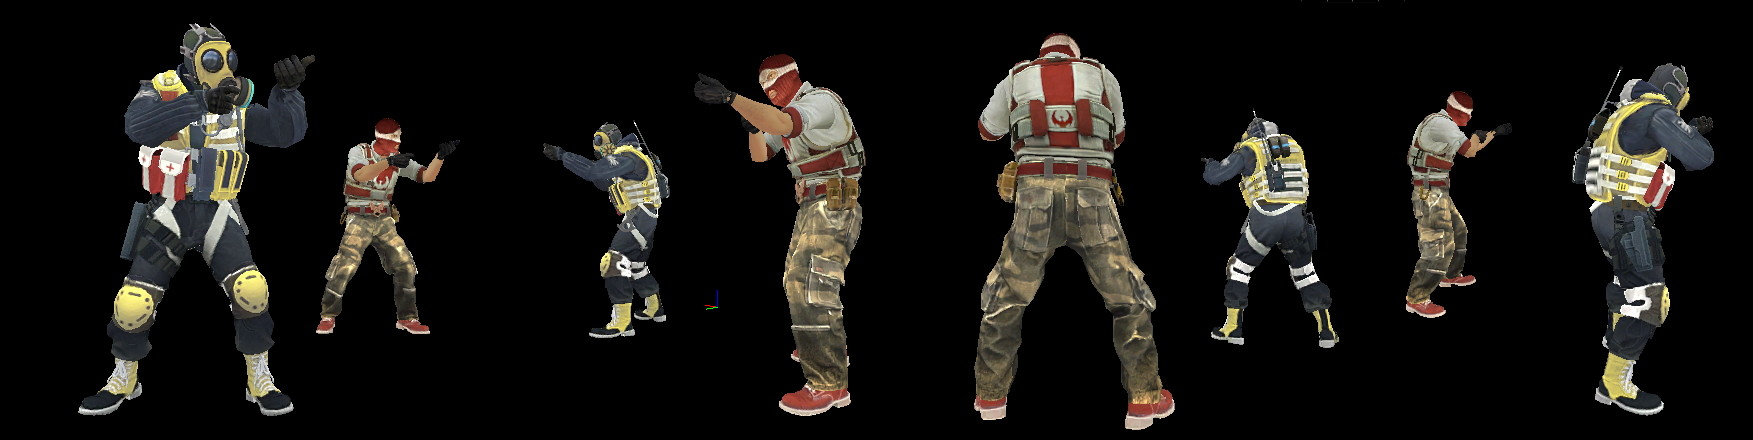 custom_playermodel_skins.jpg.b0c74f315f7041d48a591bbe717314ac.jpg